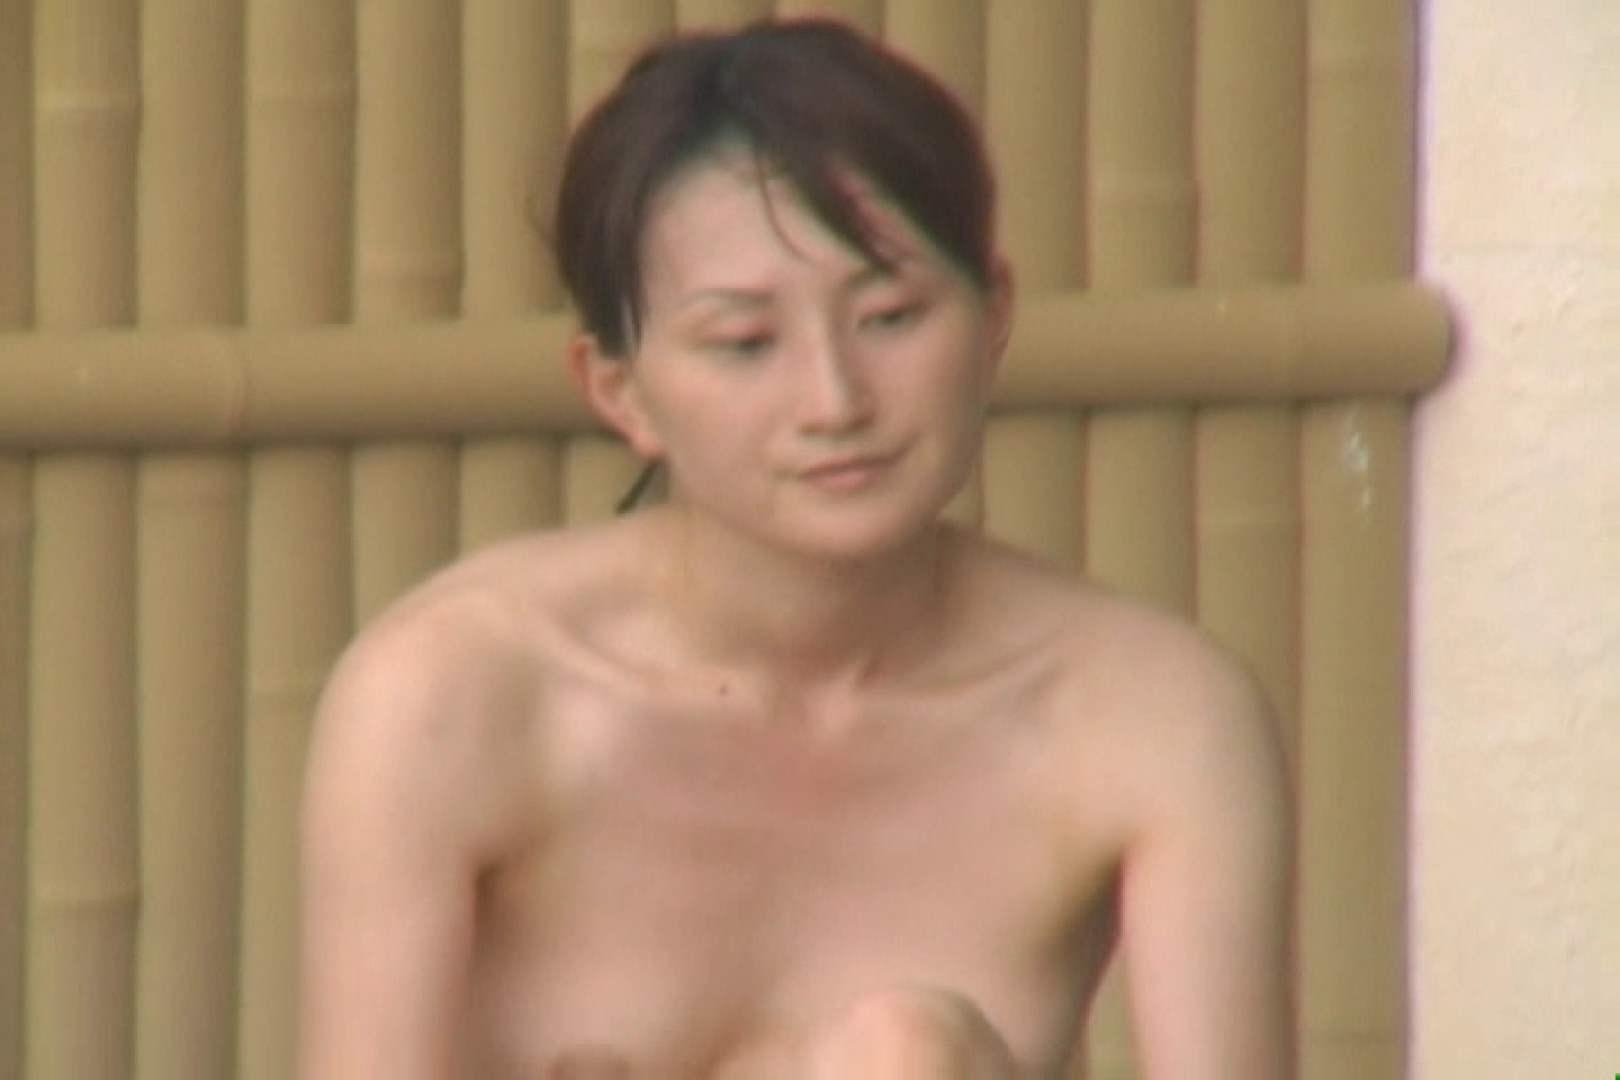 Aquaな露天風呂Vol.578 OL女体 われめAV動画紹介 77連発 20